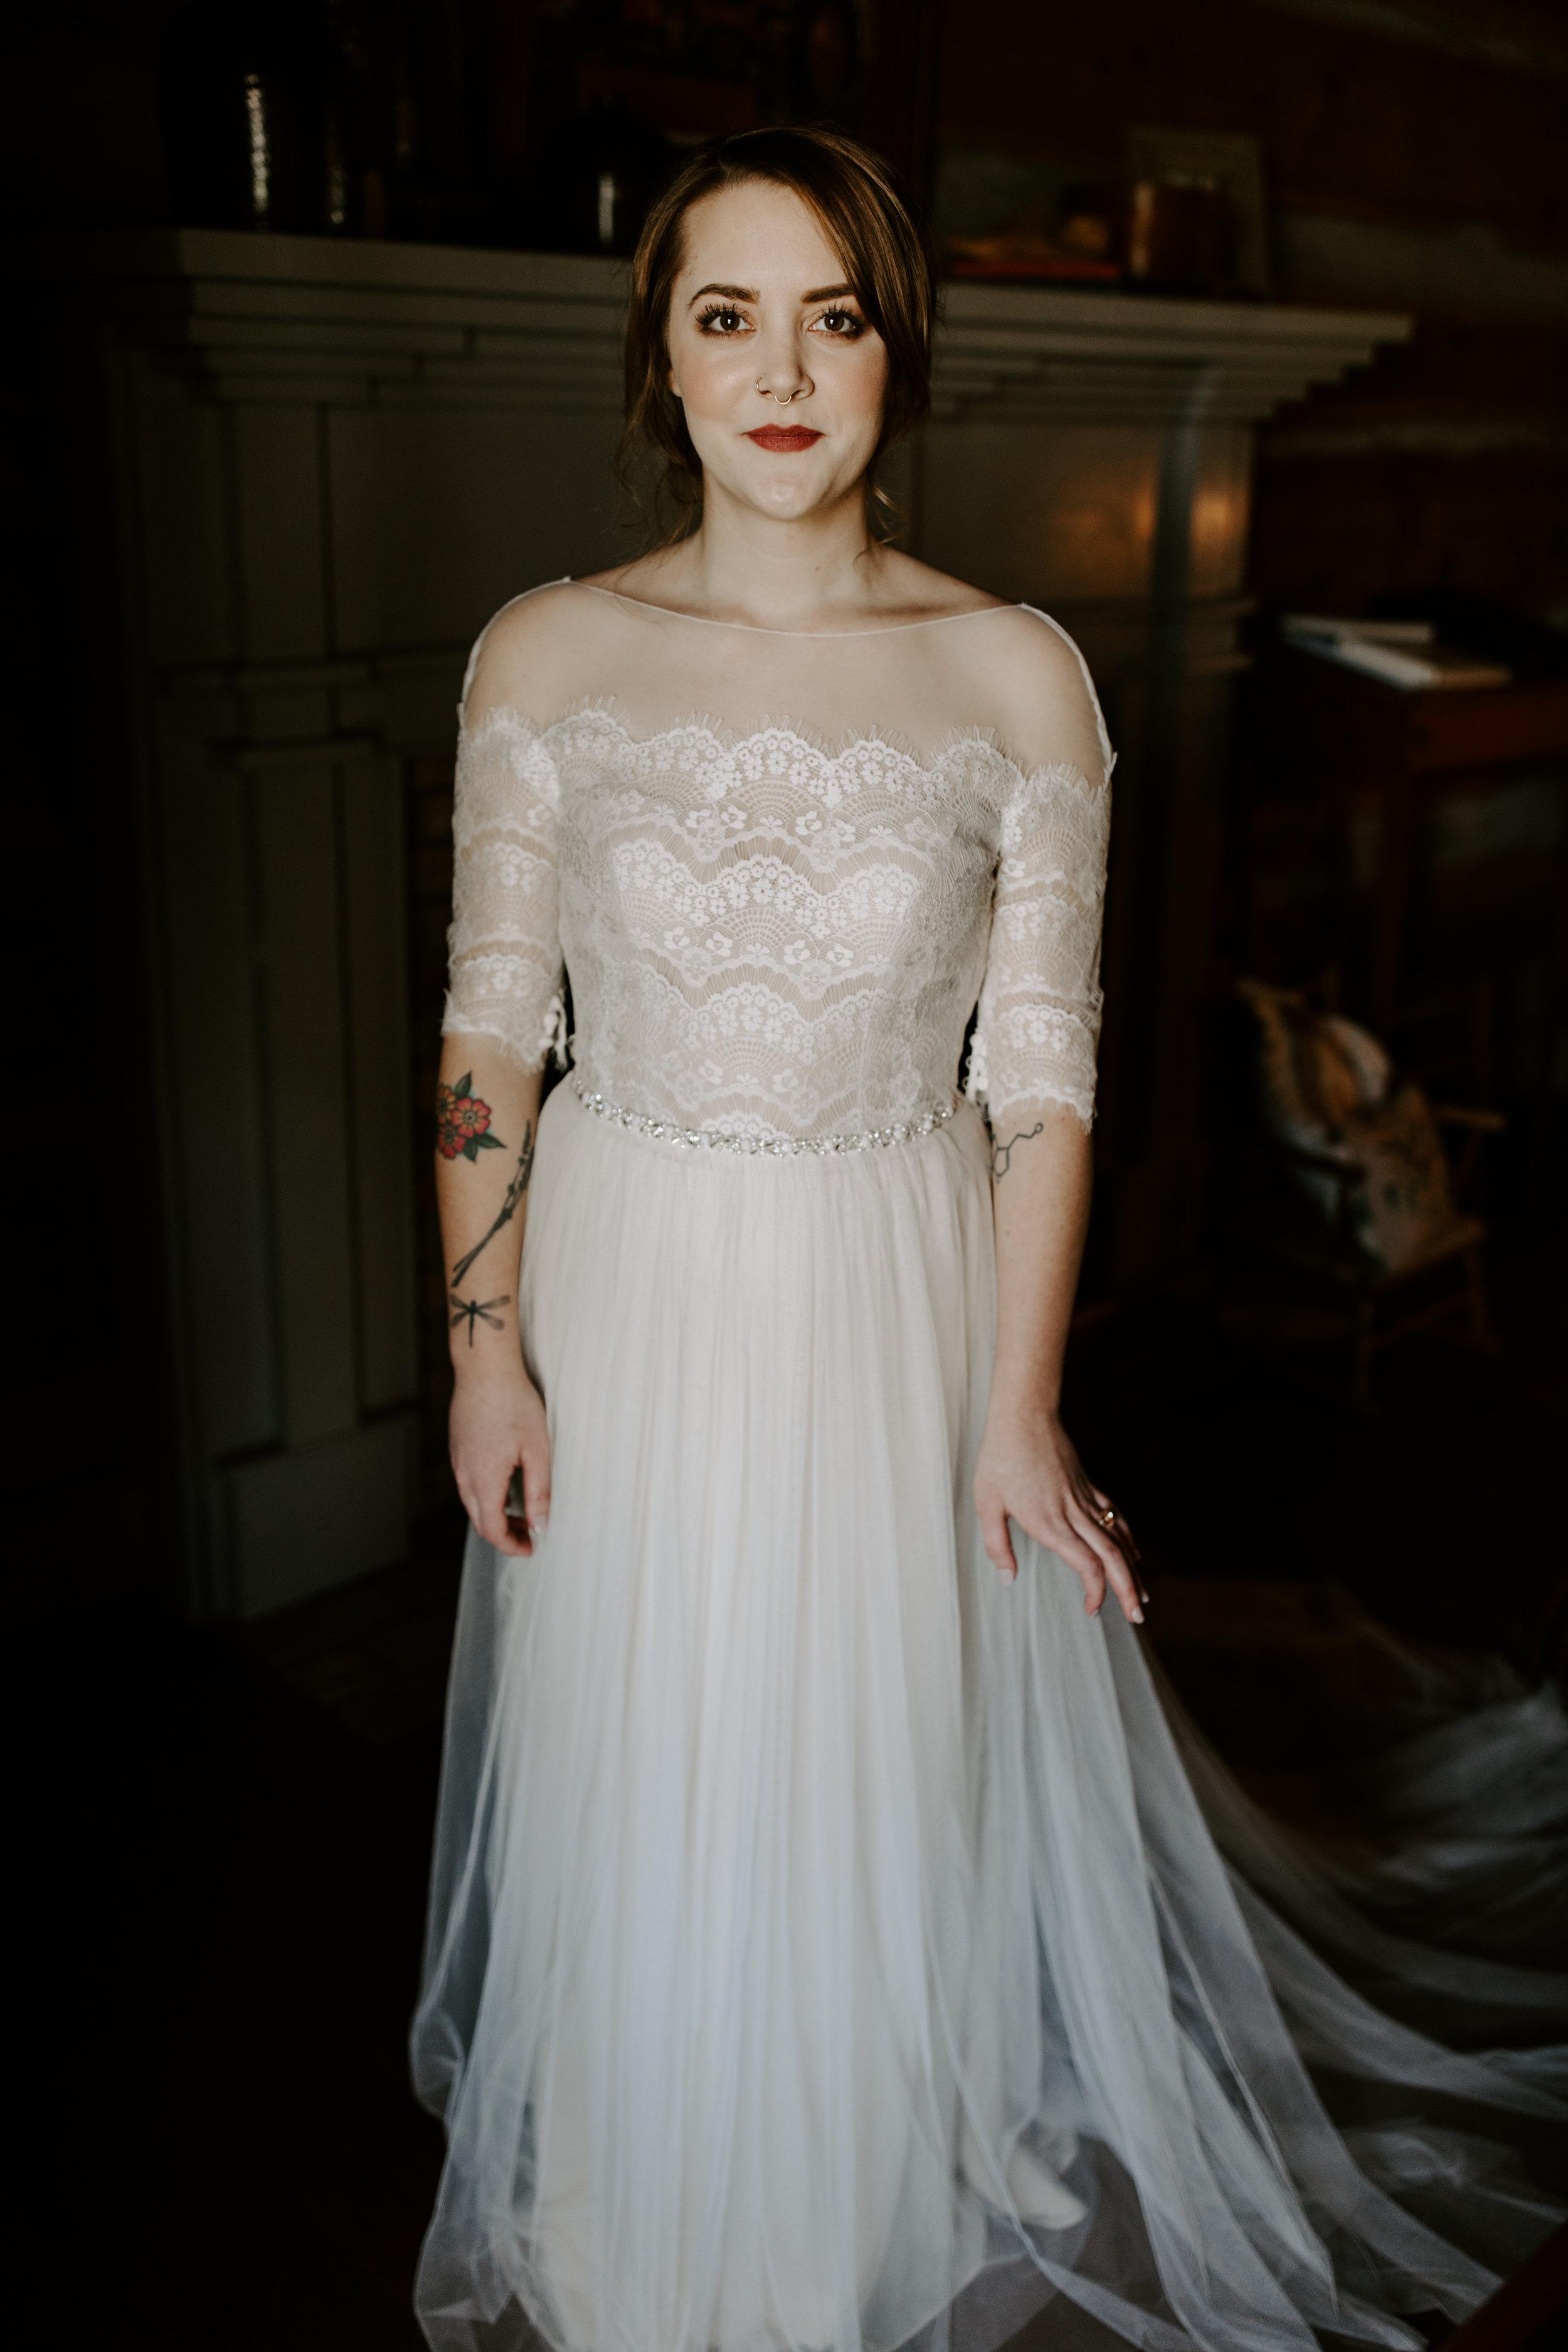 Edgy and Moody Bridal Portraits